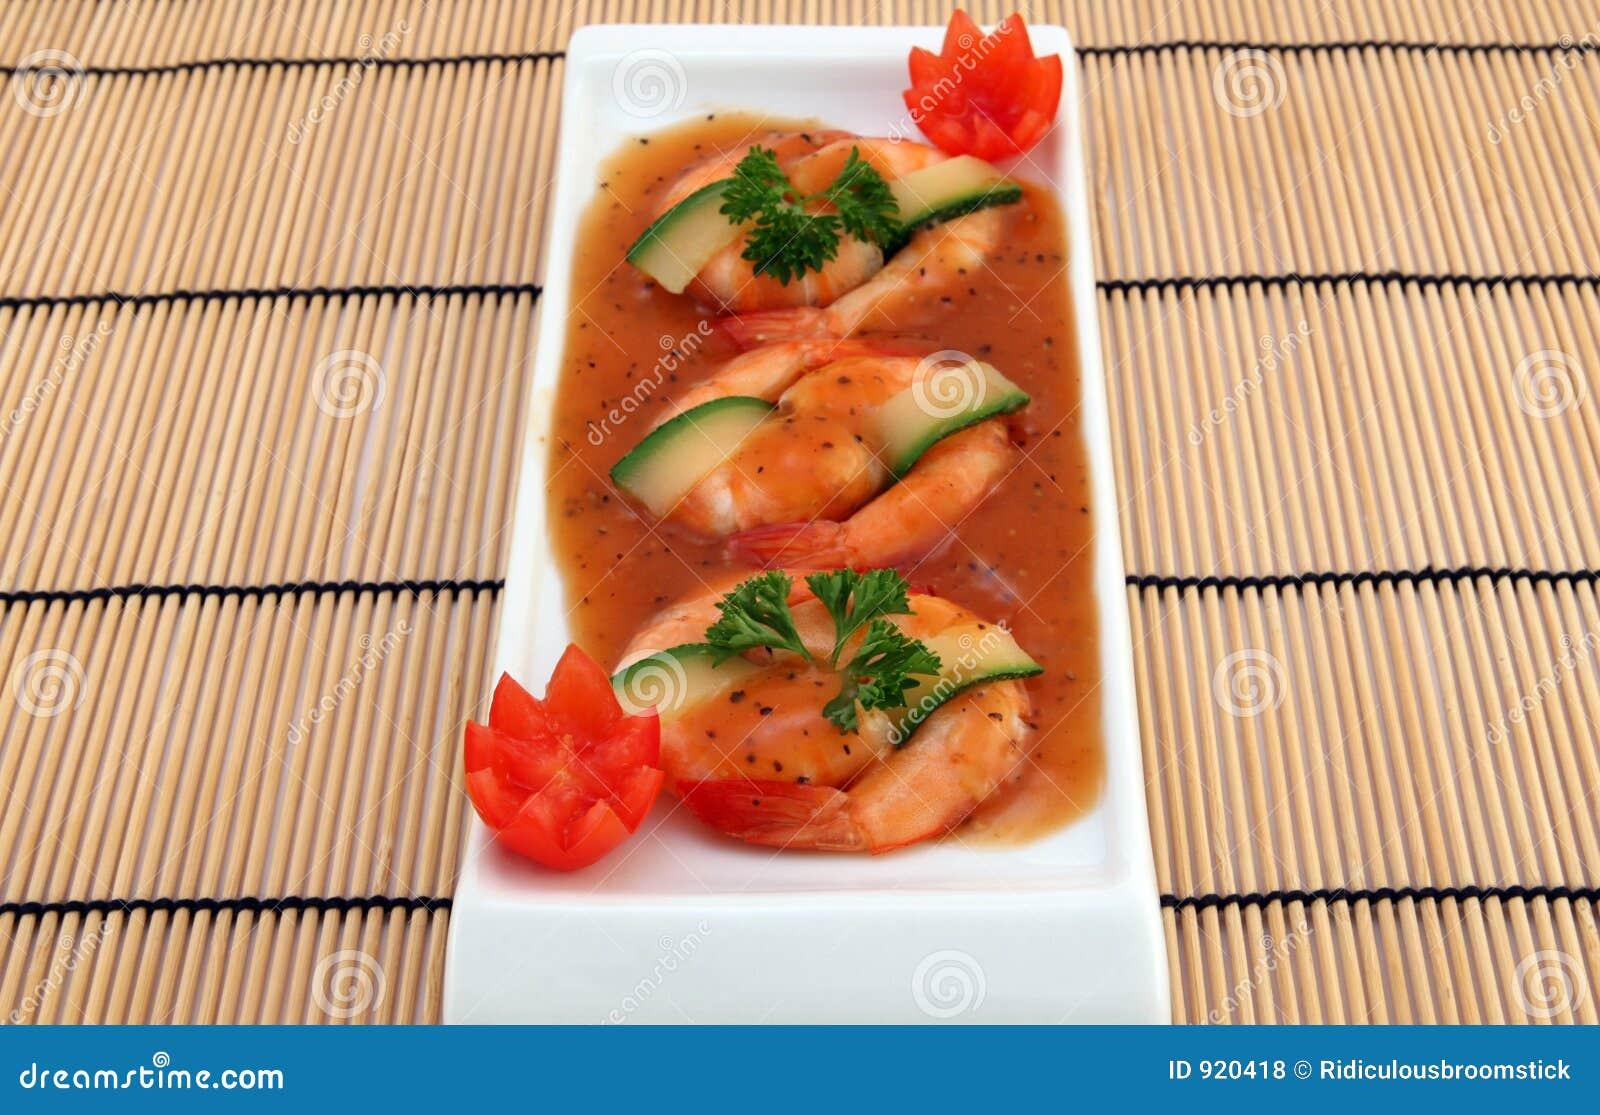 Chinese food - Gourmet broiled king tiger prawns